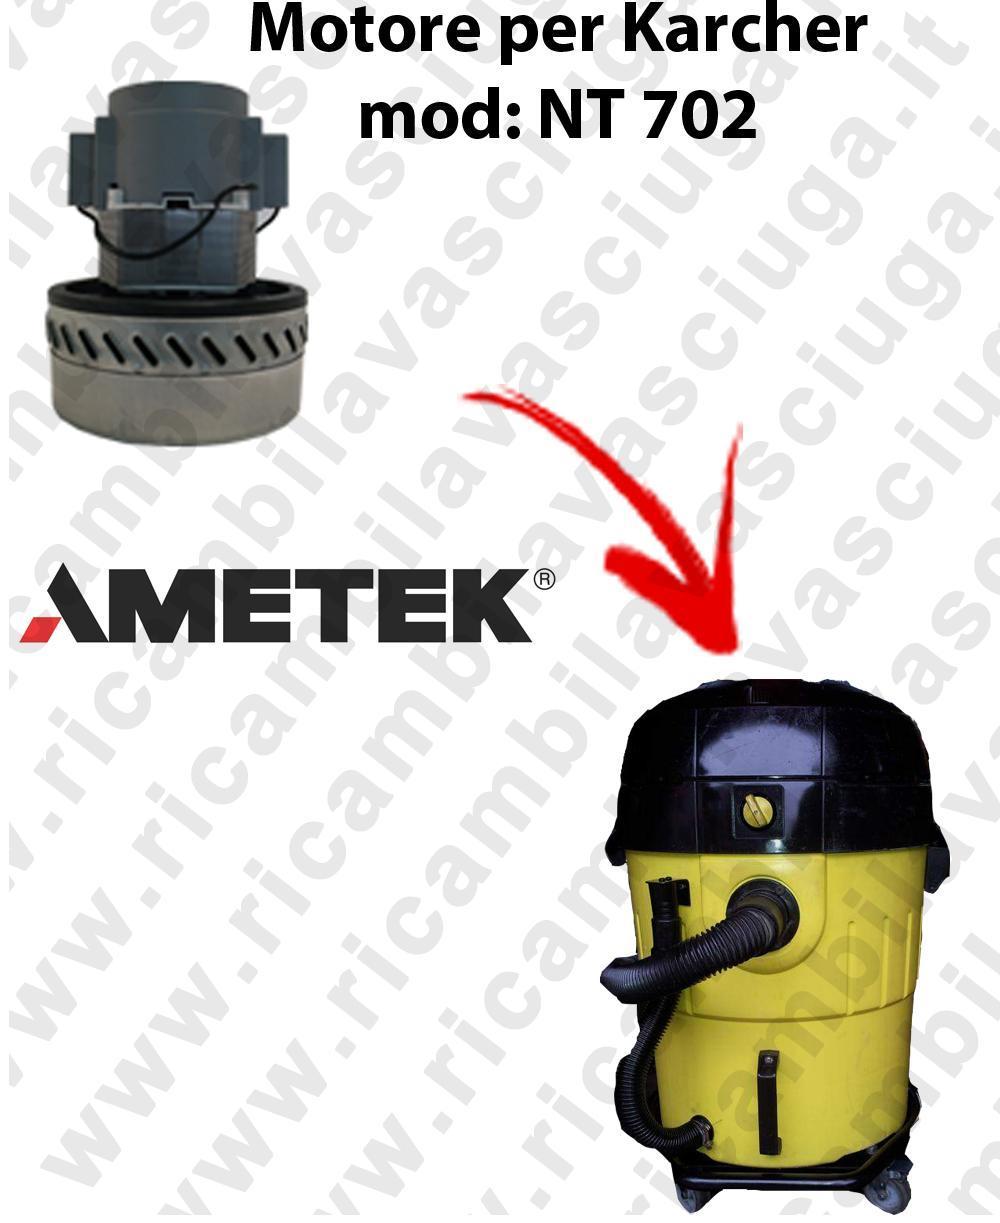 NT702 Ametek Vacuum Motor for vacuum cleaner KARCHER